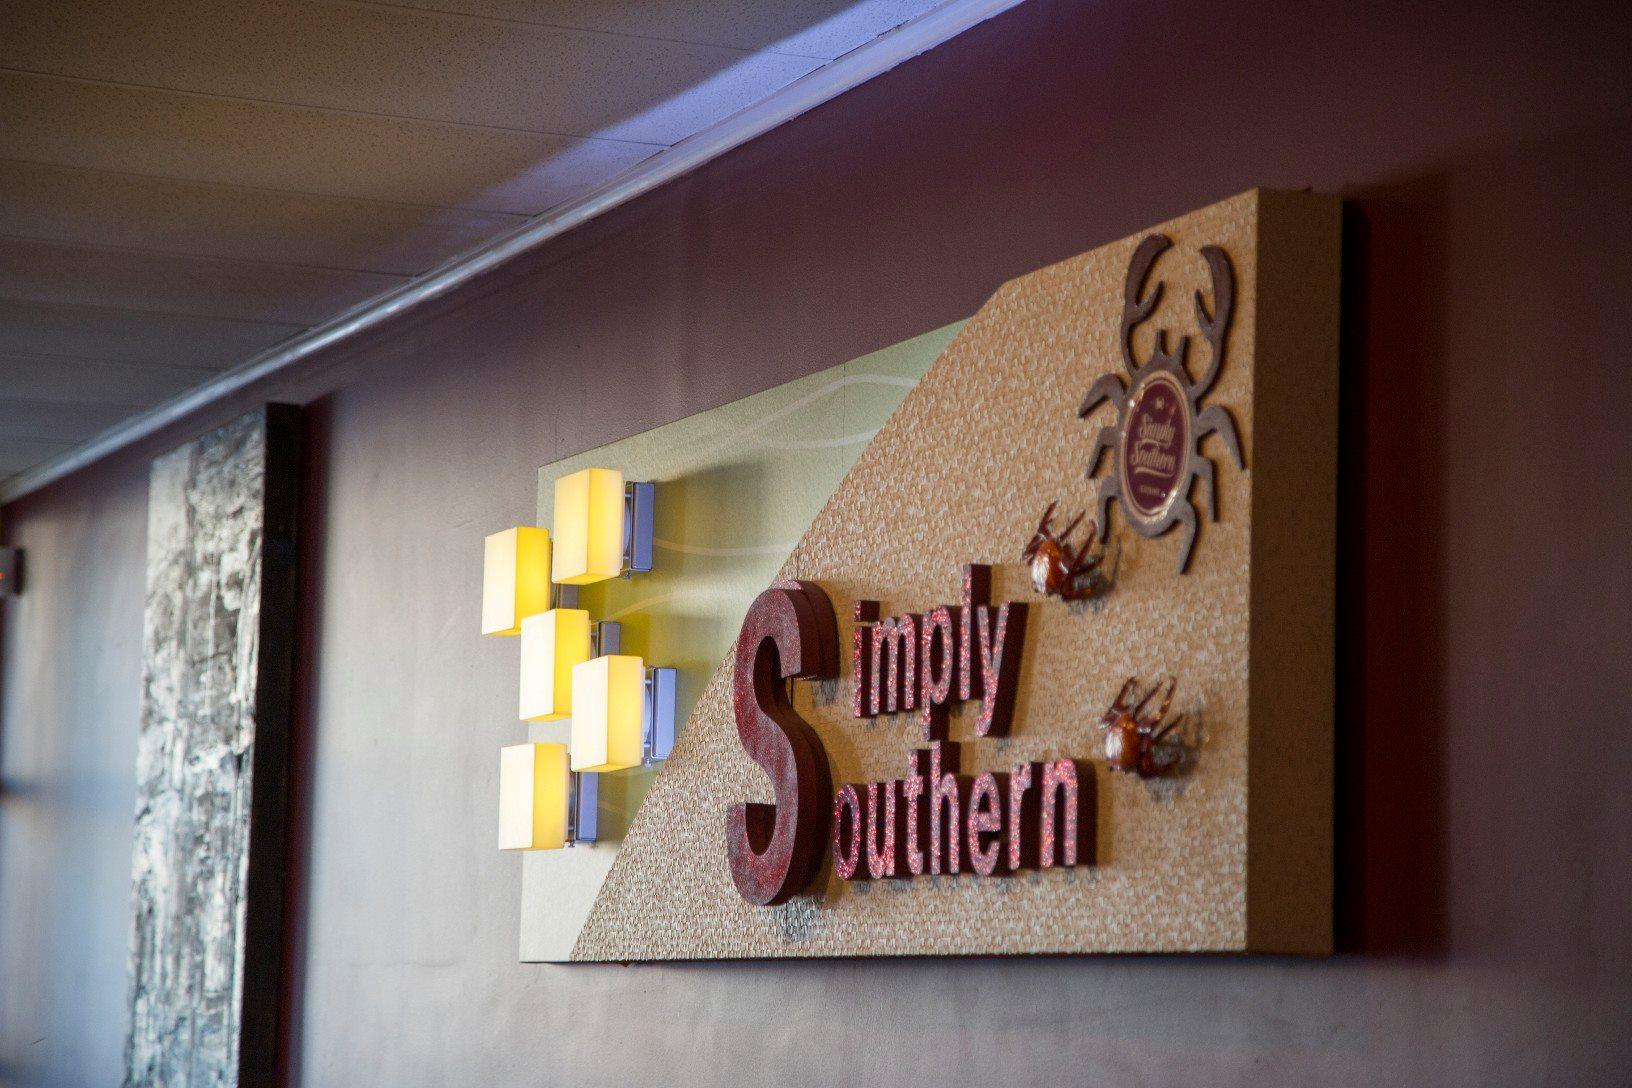 Simply Southern Cuisine LLC